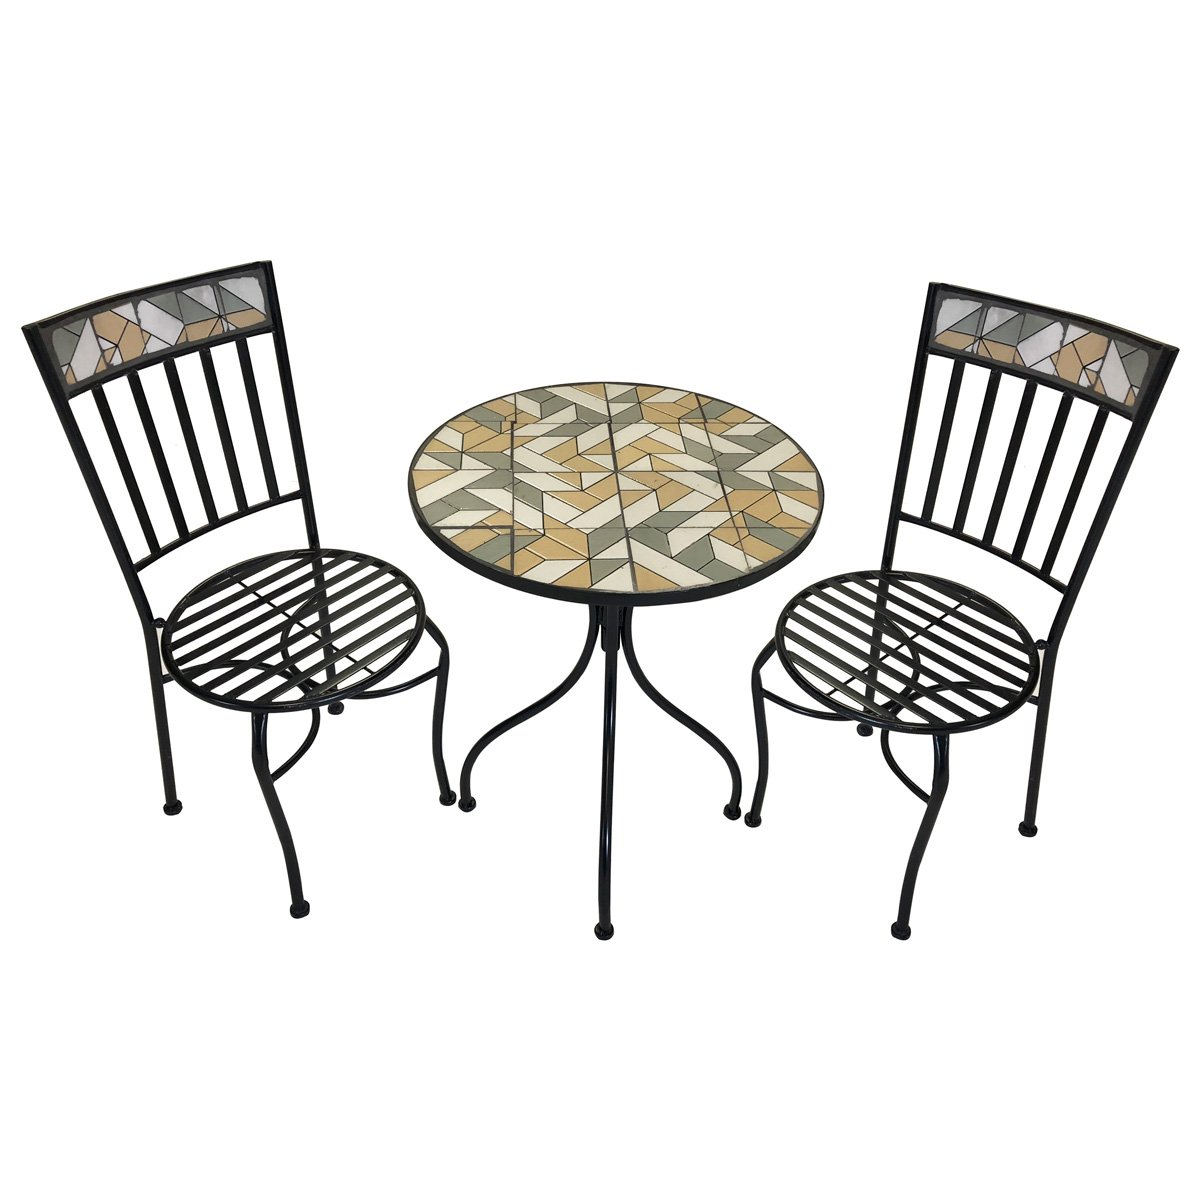 Charles Bentley 3 Pezzi Pieghevole in Metallo Bistro fissato Giardino Patio Mobili Tavola Rotonda e 2 sedie Orange